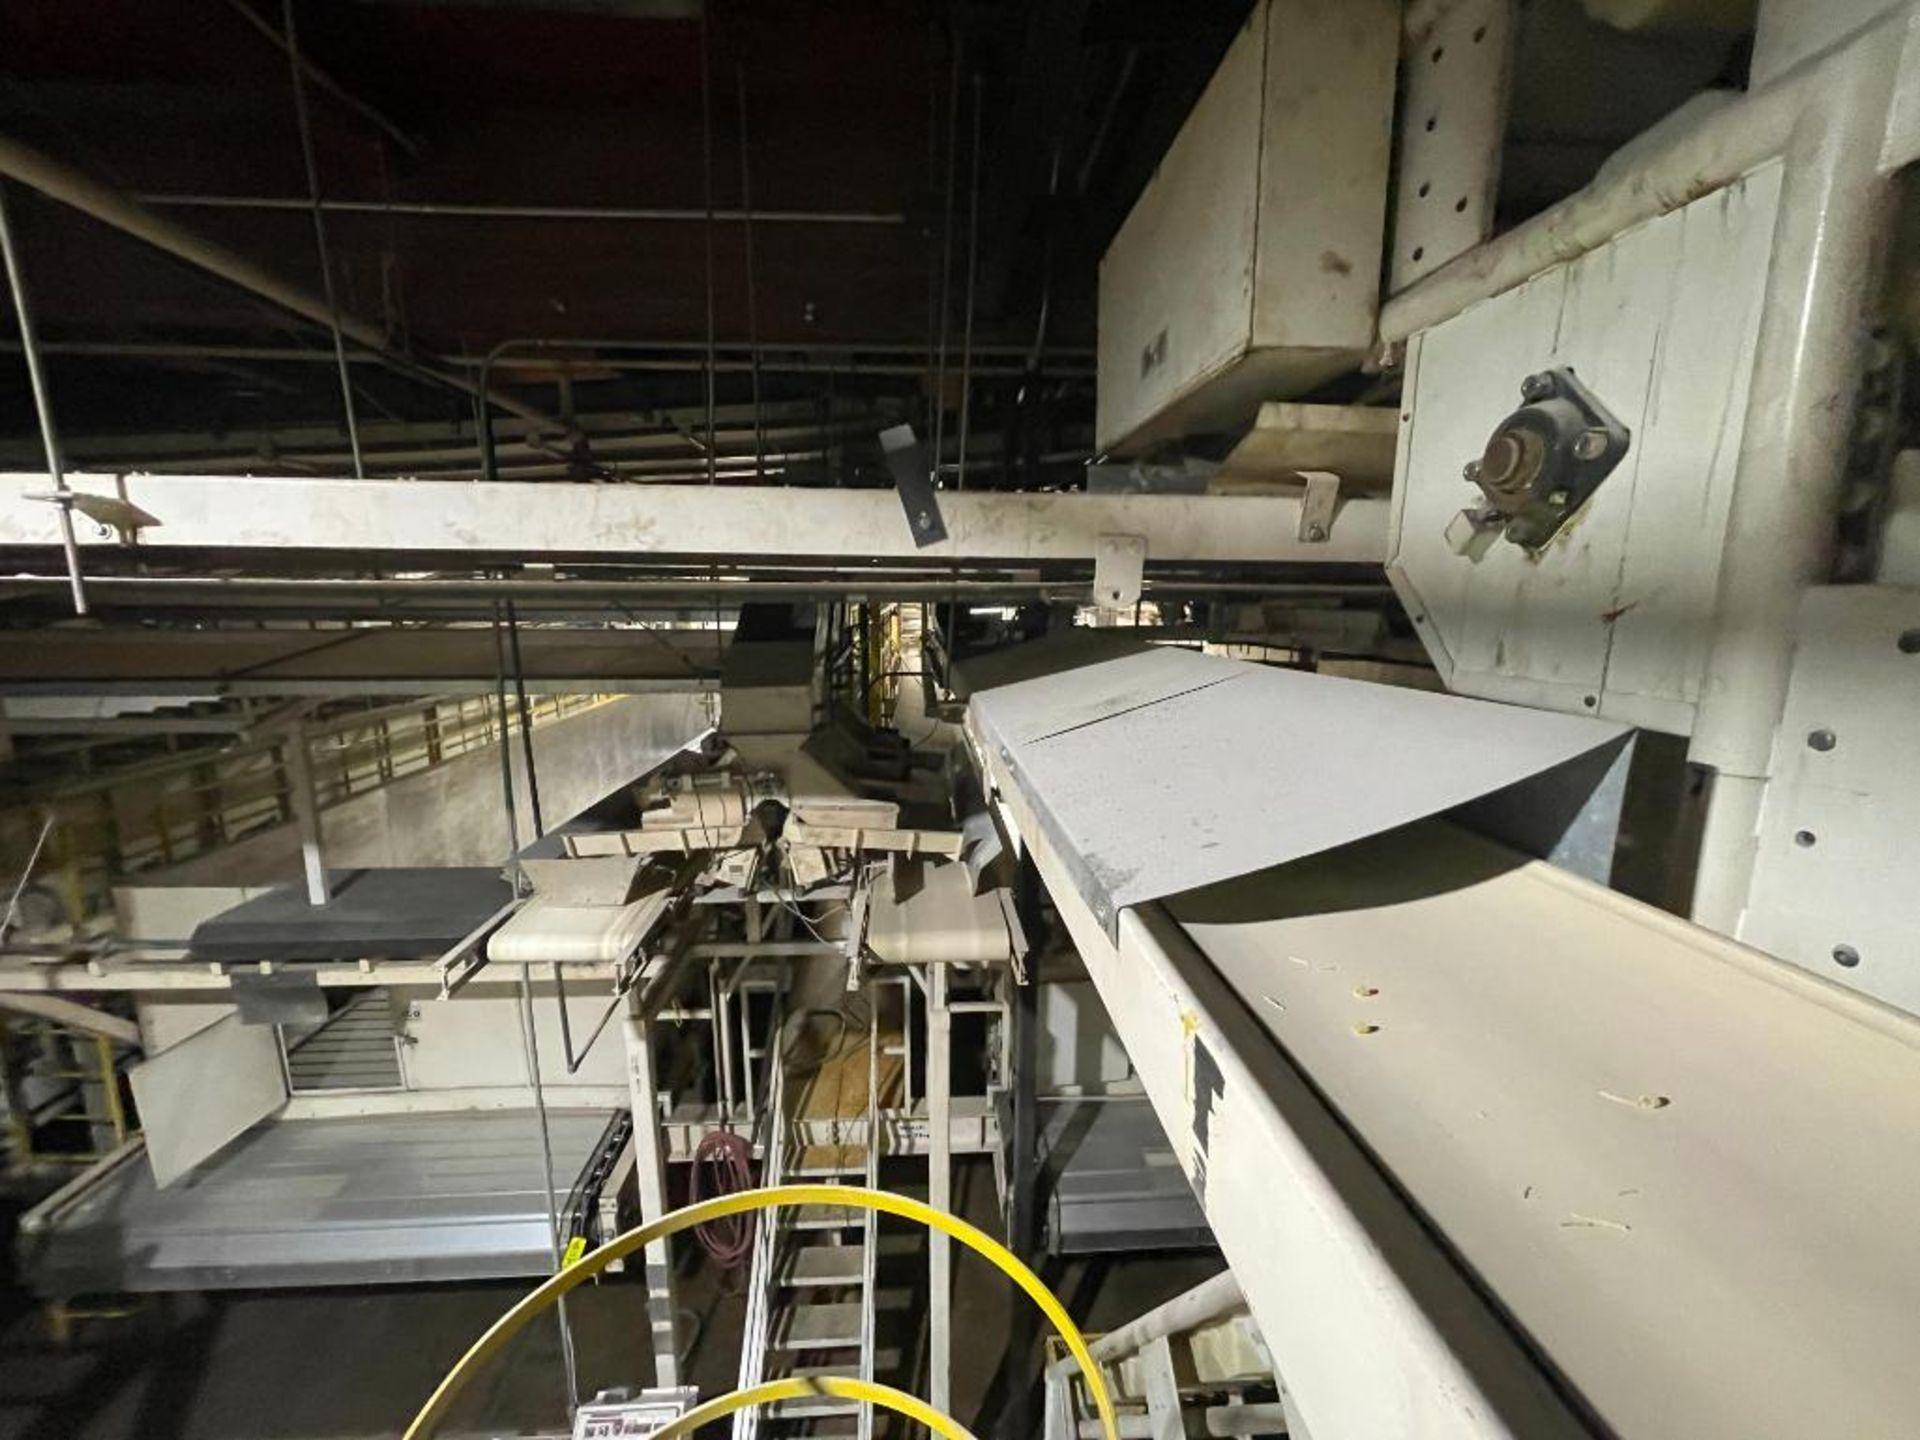 2 Aseeco horizontal overhead mild steel belt conveyors - Image 8 of 9